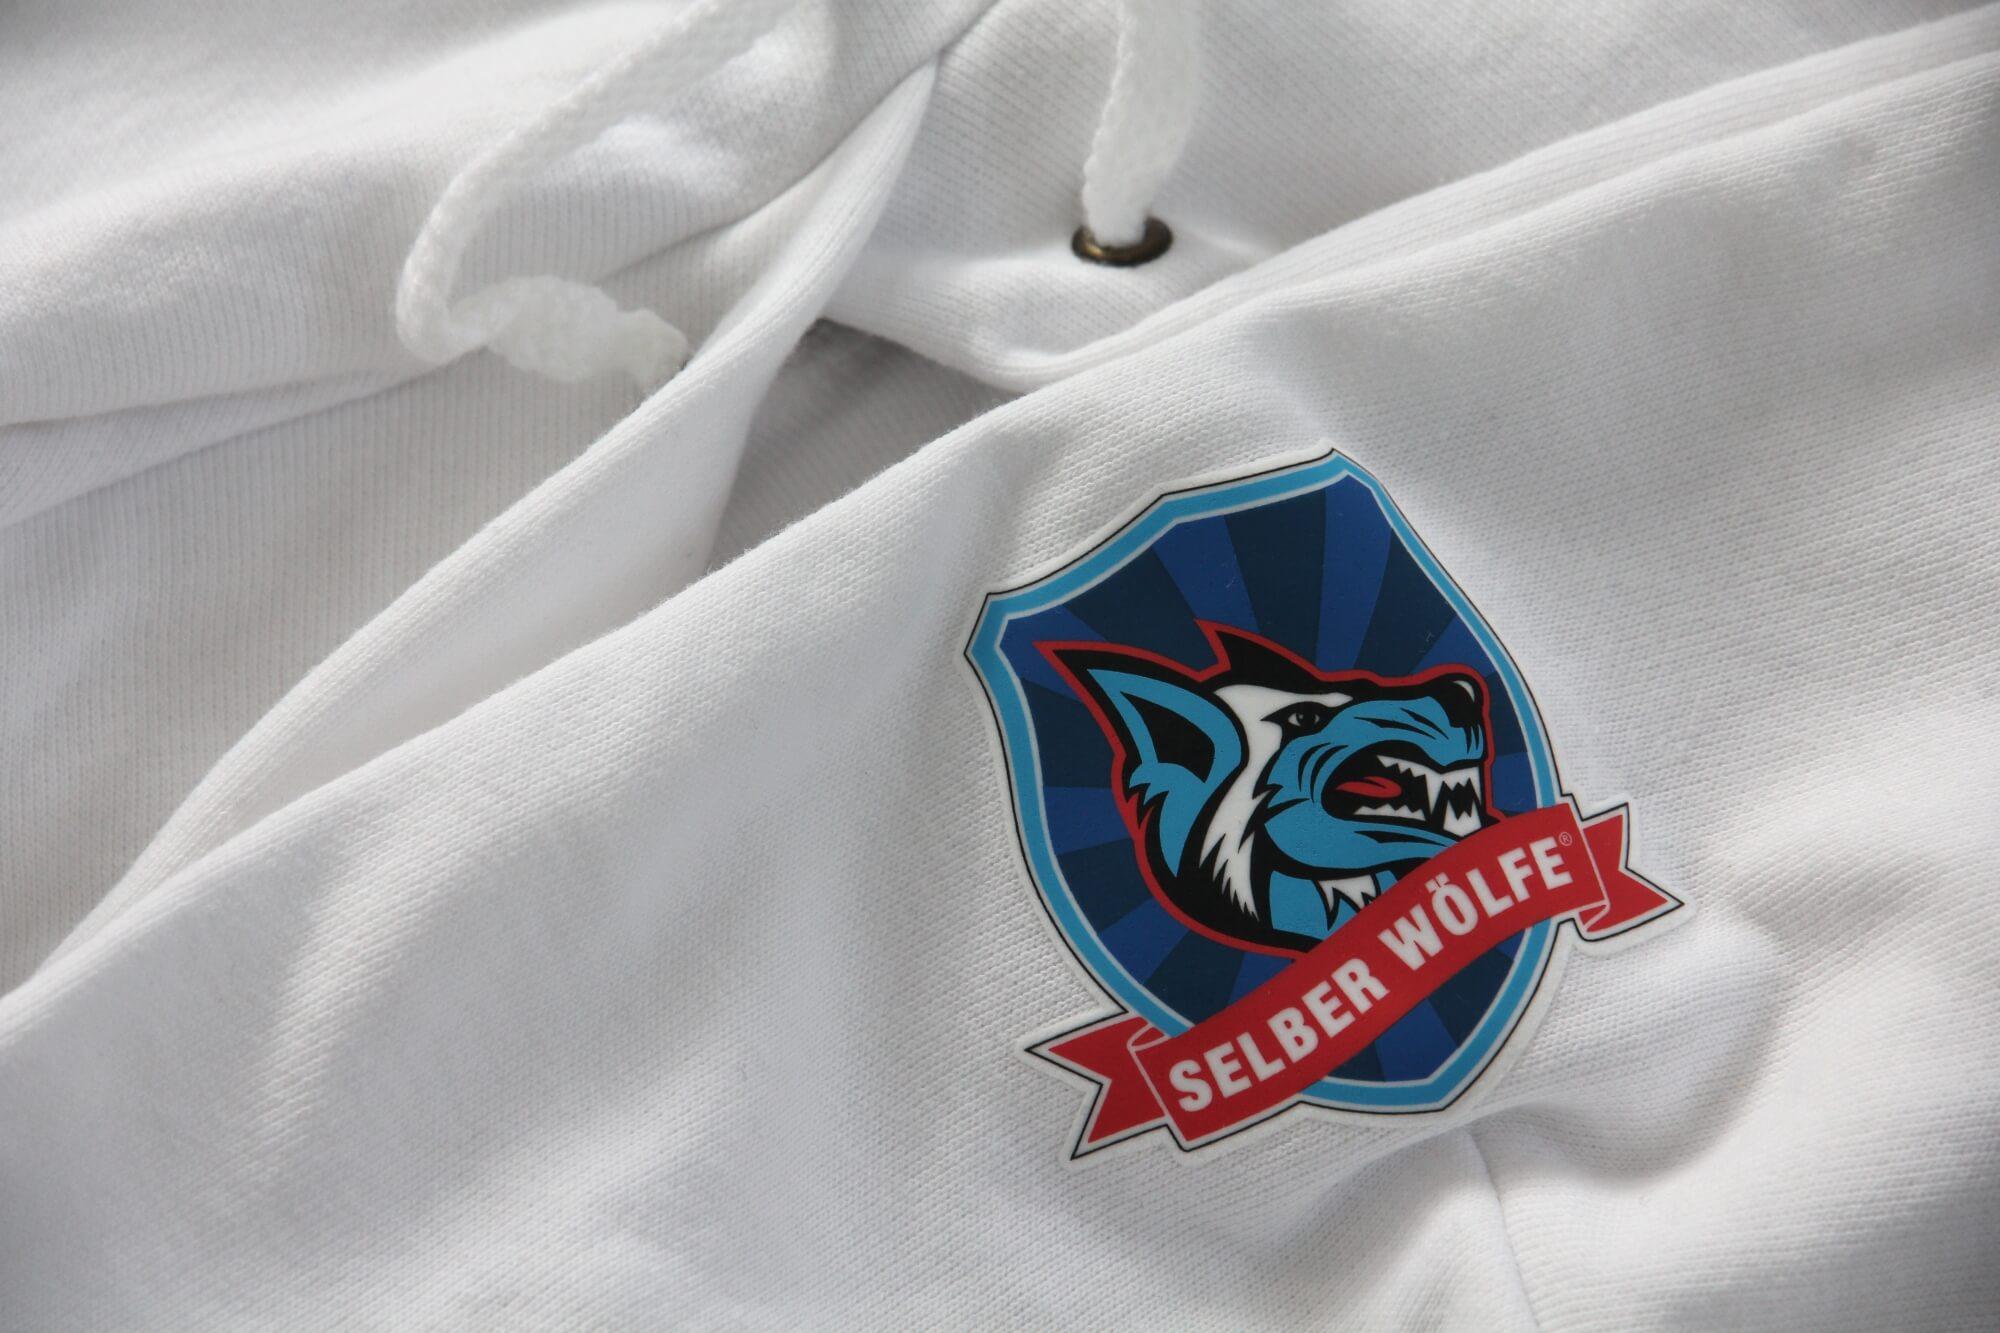 STADIONBEDARF: <br>Merch-Partner der Selber Wölfe